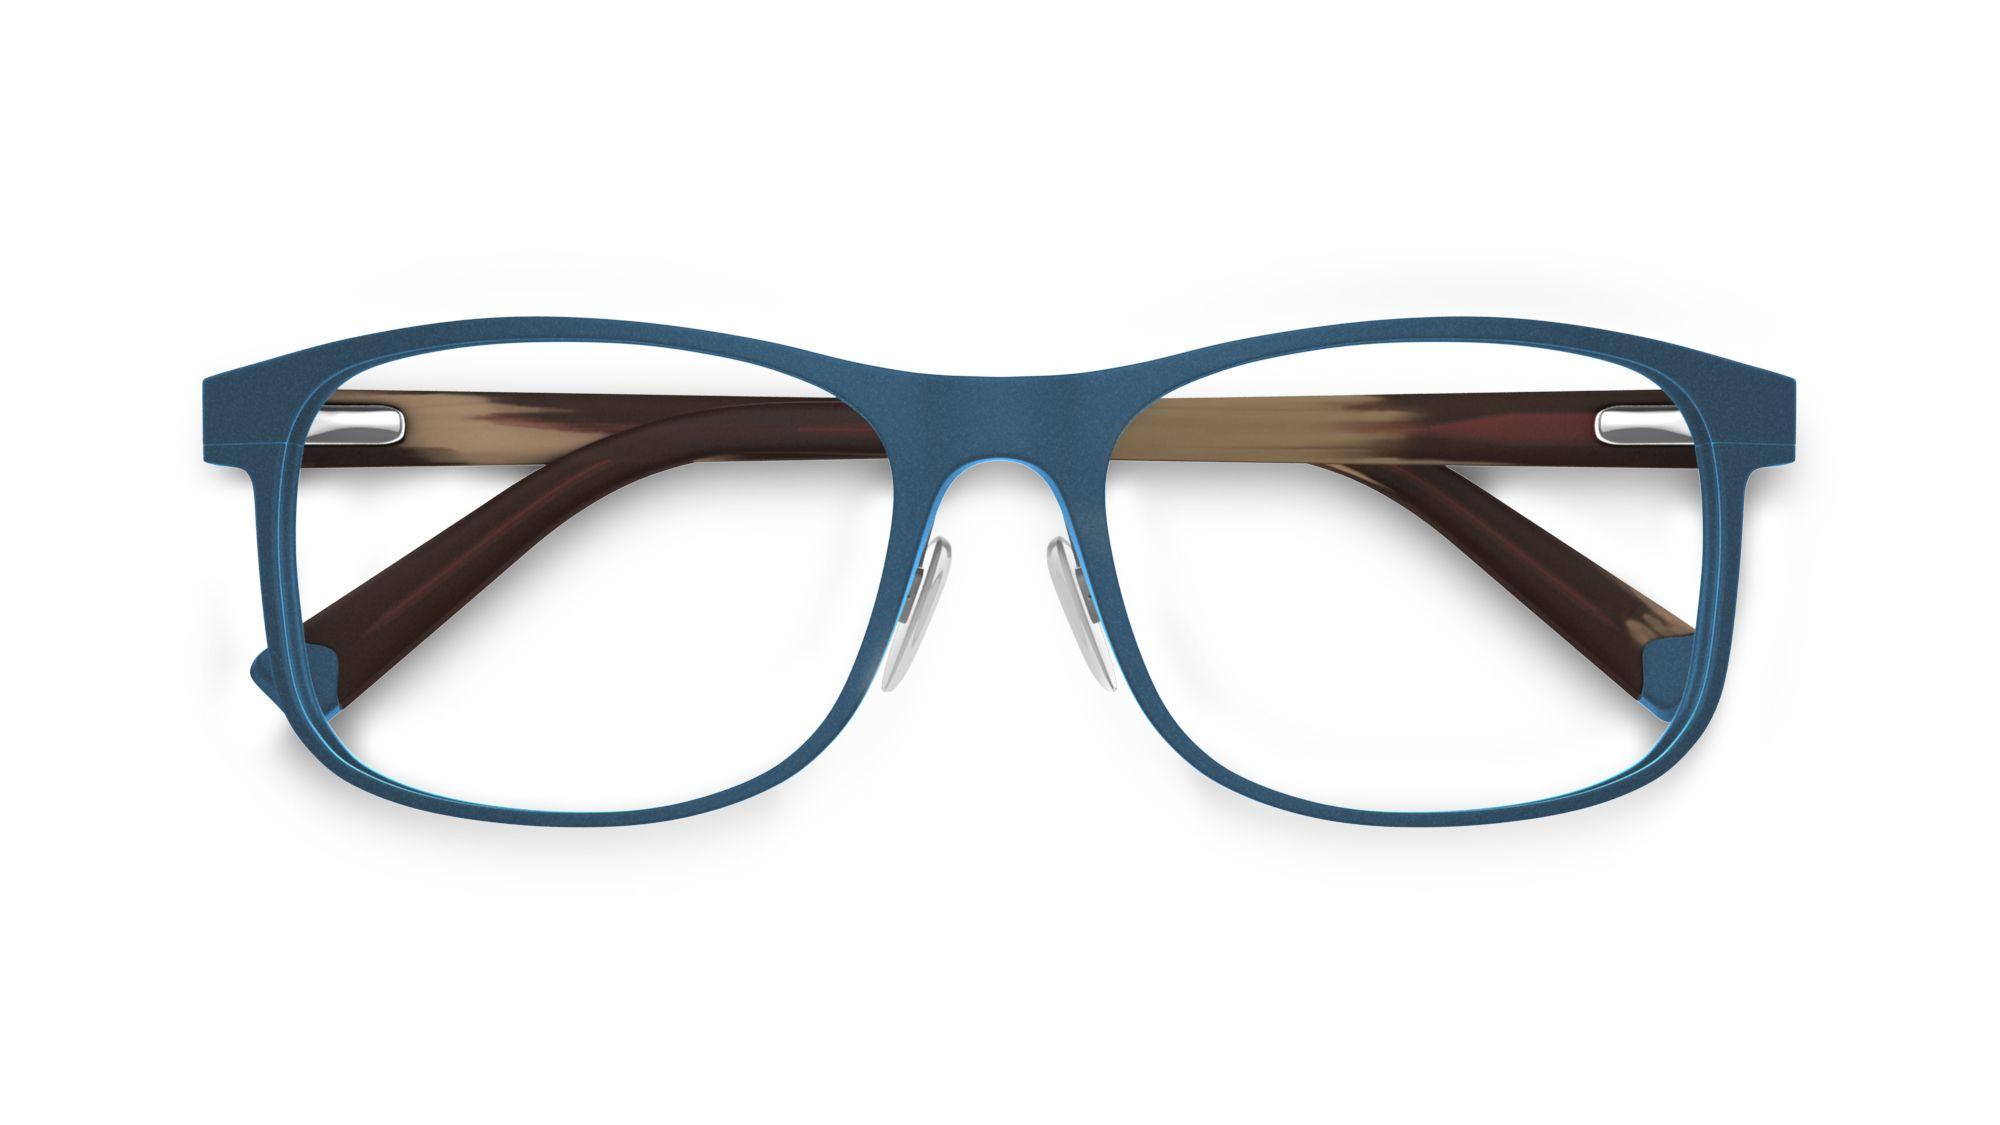 Specsavers glasses - EUROPA | GLASSES: READING & SHADES | Pinterest ...